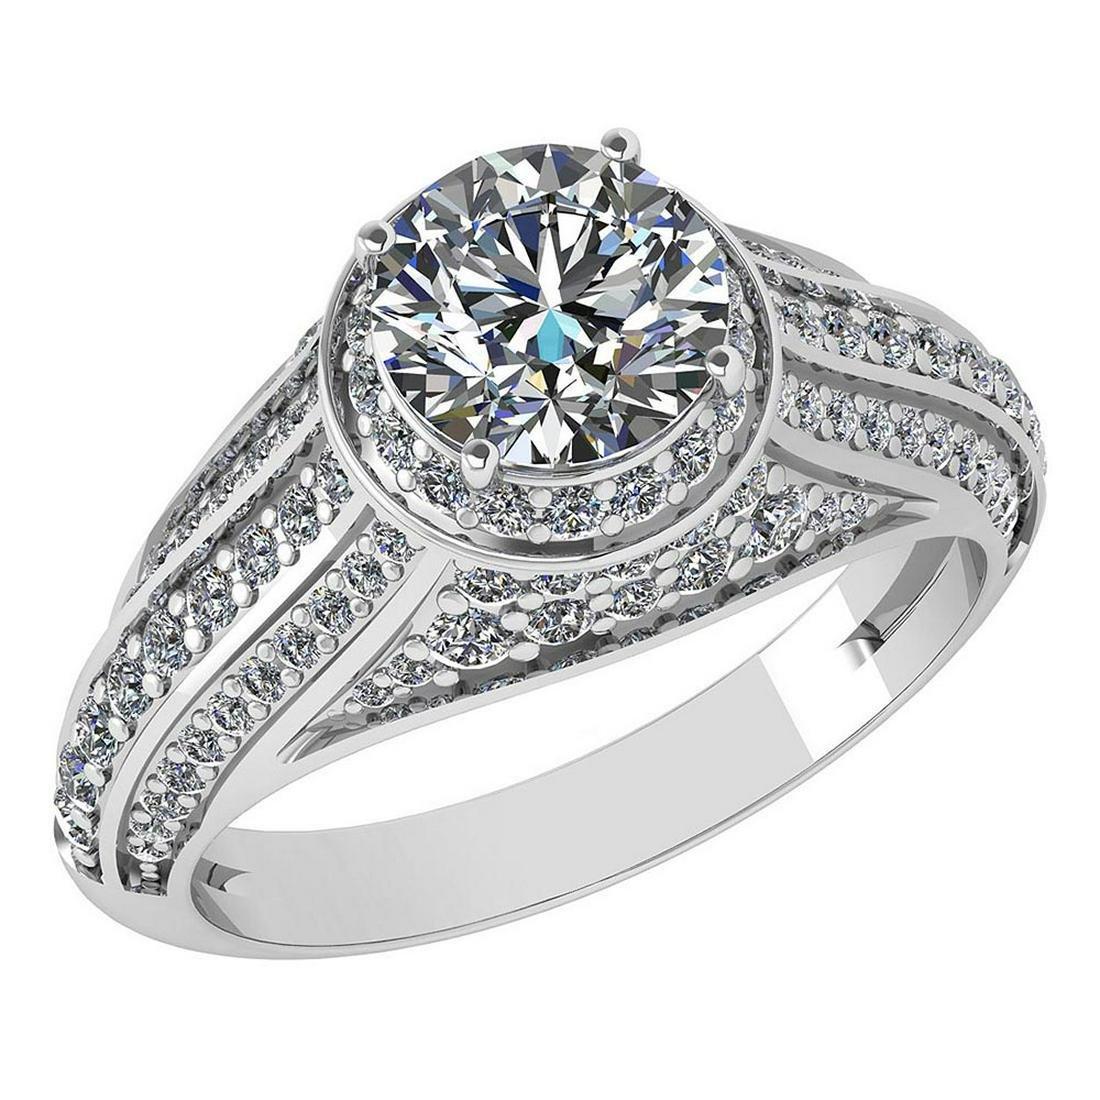 Certified 2.04 Ctw Diamond Engagement /Wedding 14K Whit